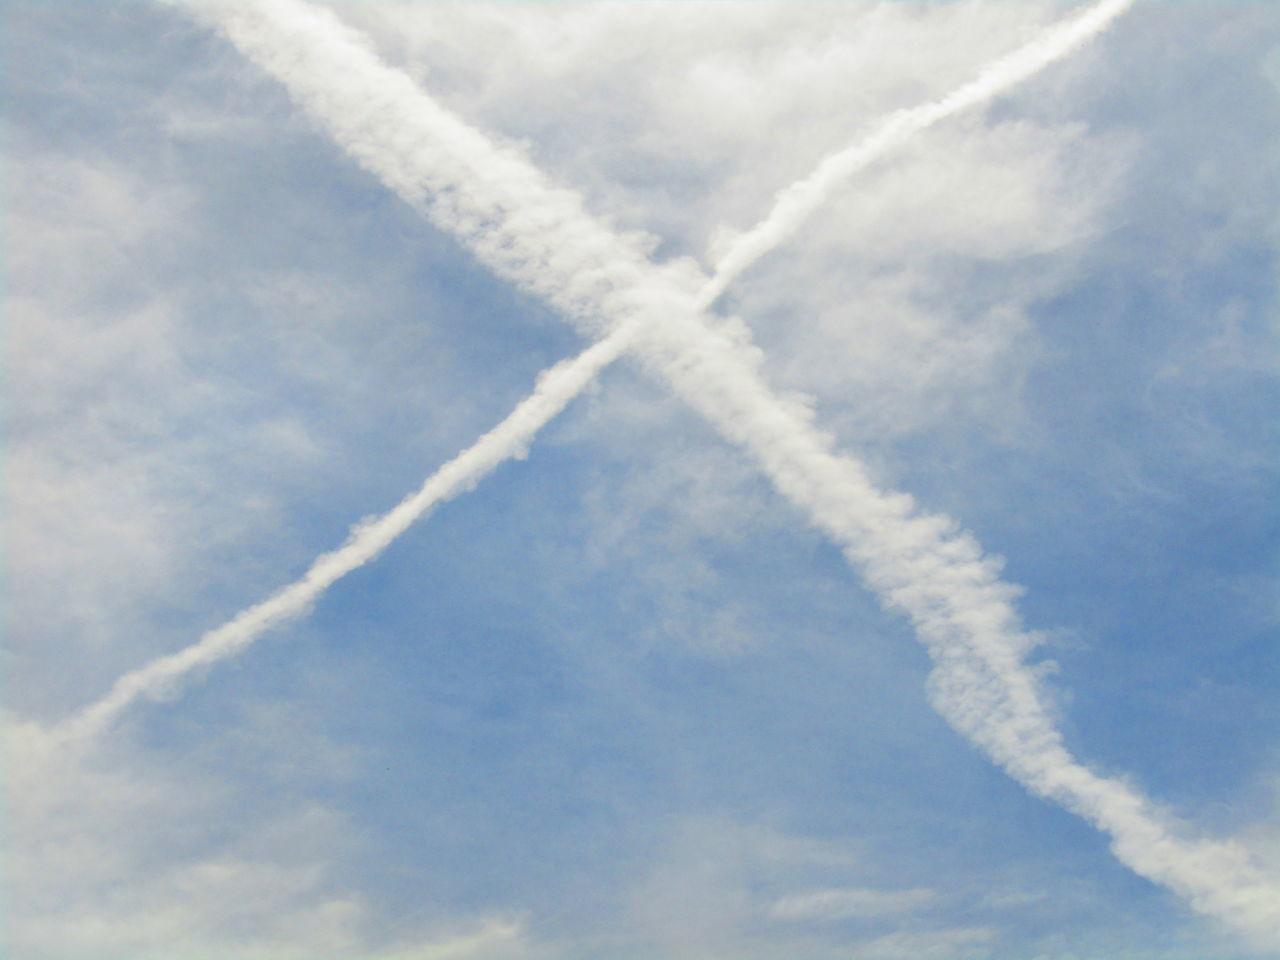 Vapor Trail Sky Pattern Kondensstreifen Contrail Chemtrails Chemtrail Himmel